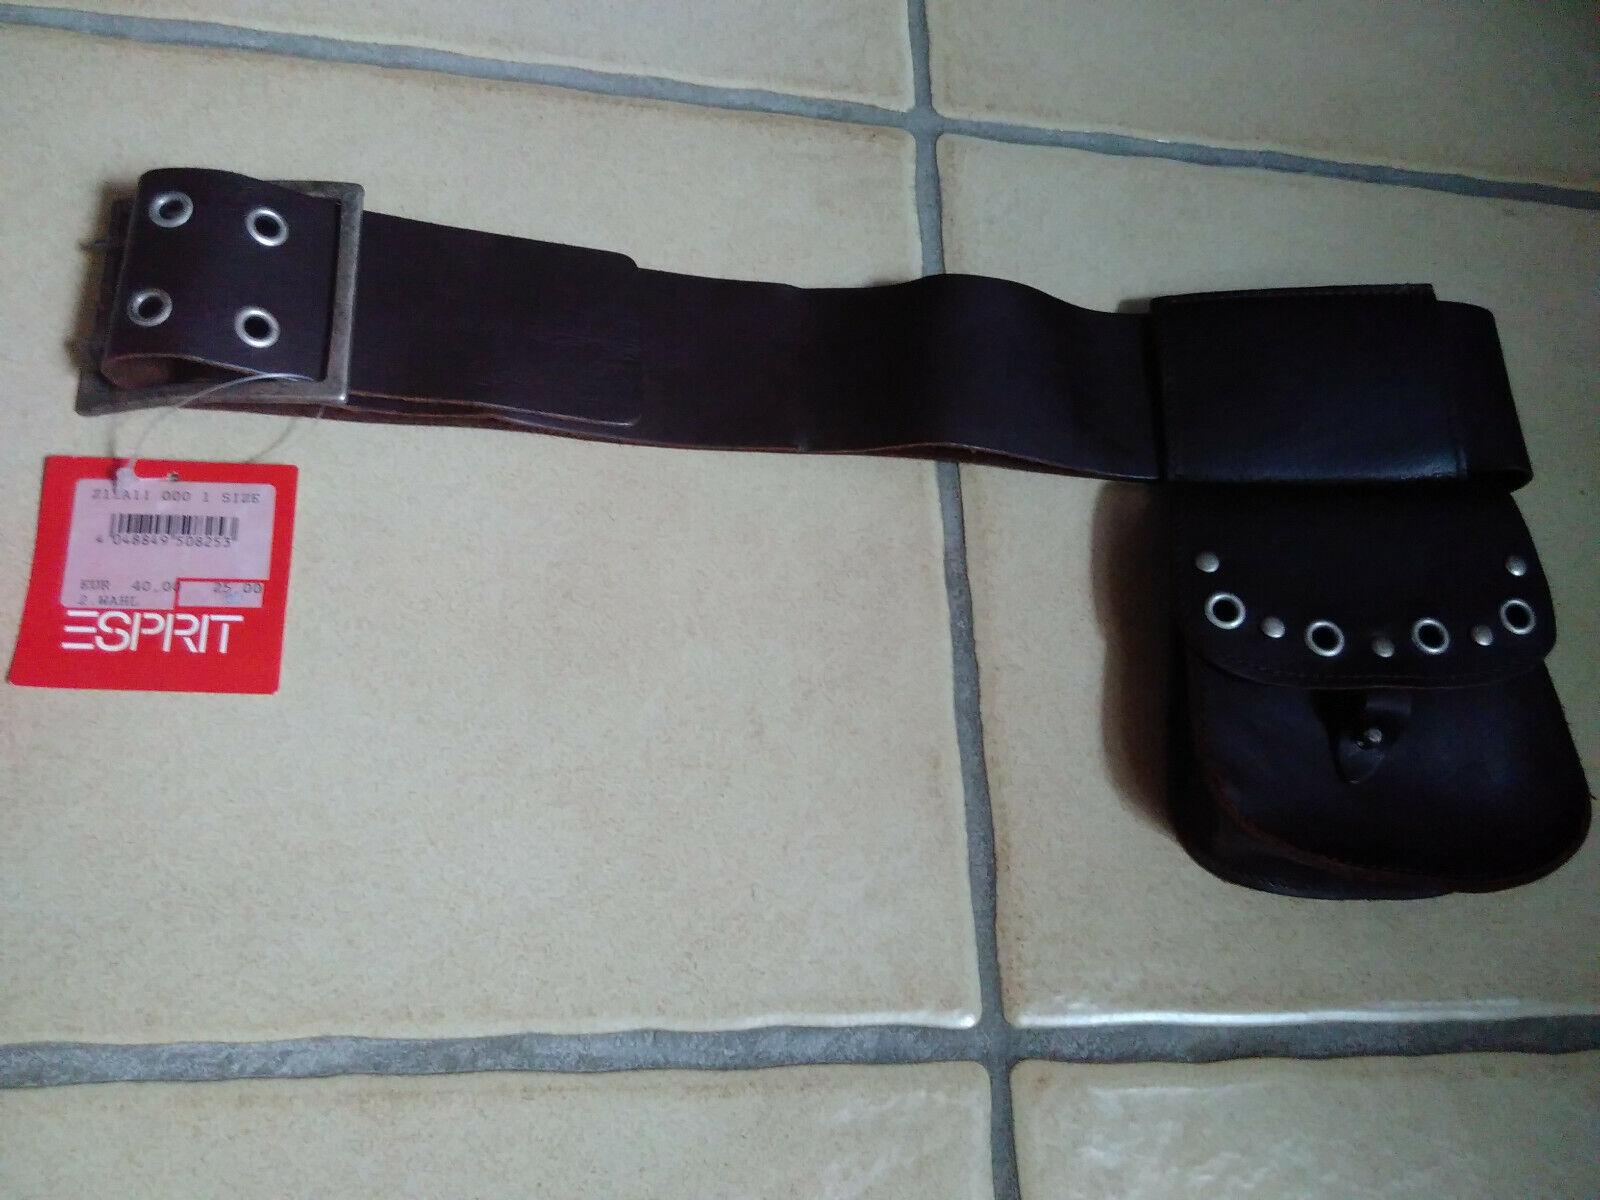 ESPRIT Taschen & Gürtel ~ Echtleder ~ Nieten ~ Braun ~ NEU